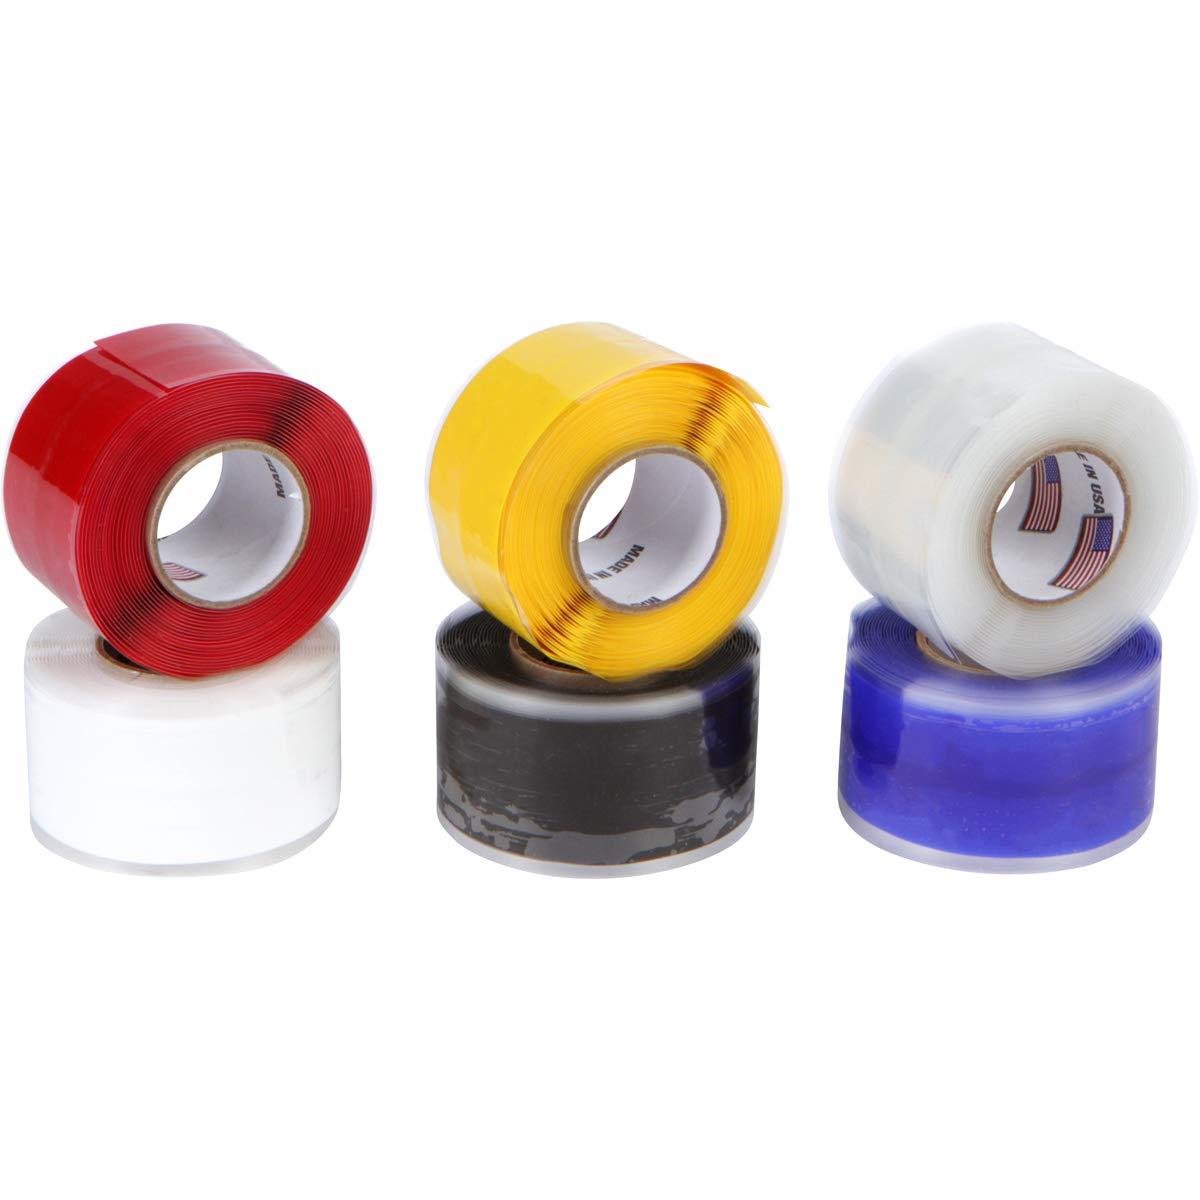 Miracle Wrap Self-Fusing Silicone Repair Tape (Pack of 6)